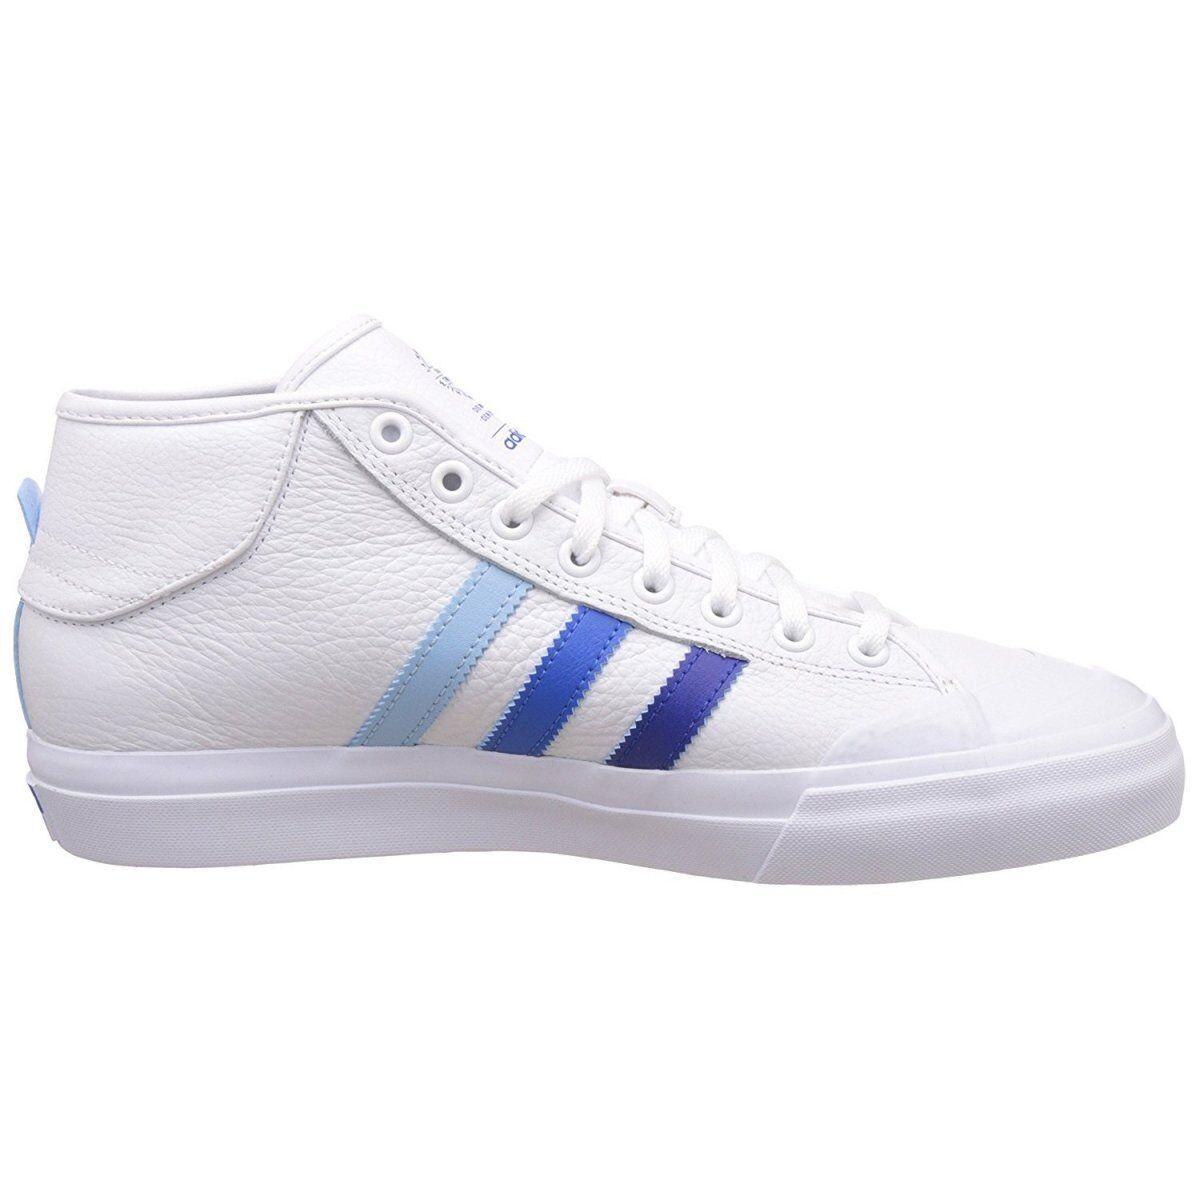 ADIDAS ORIGINALS MATCHCOURT MID Hombre B72895 skateboarding Zapatos  zapatillas B72895 Hombre 697662